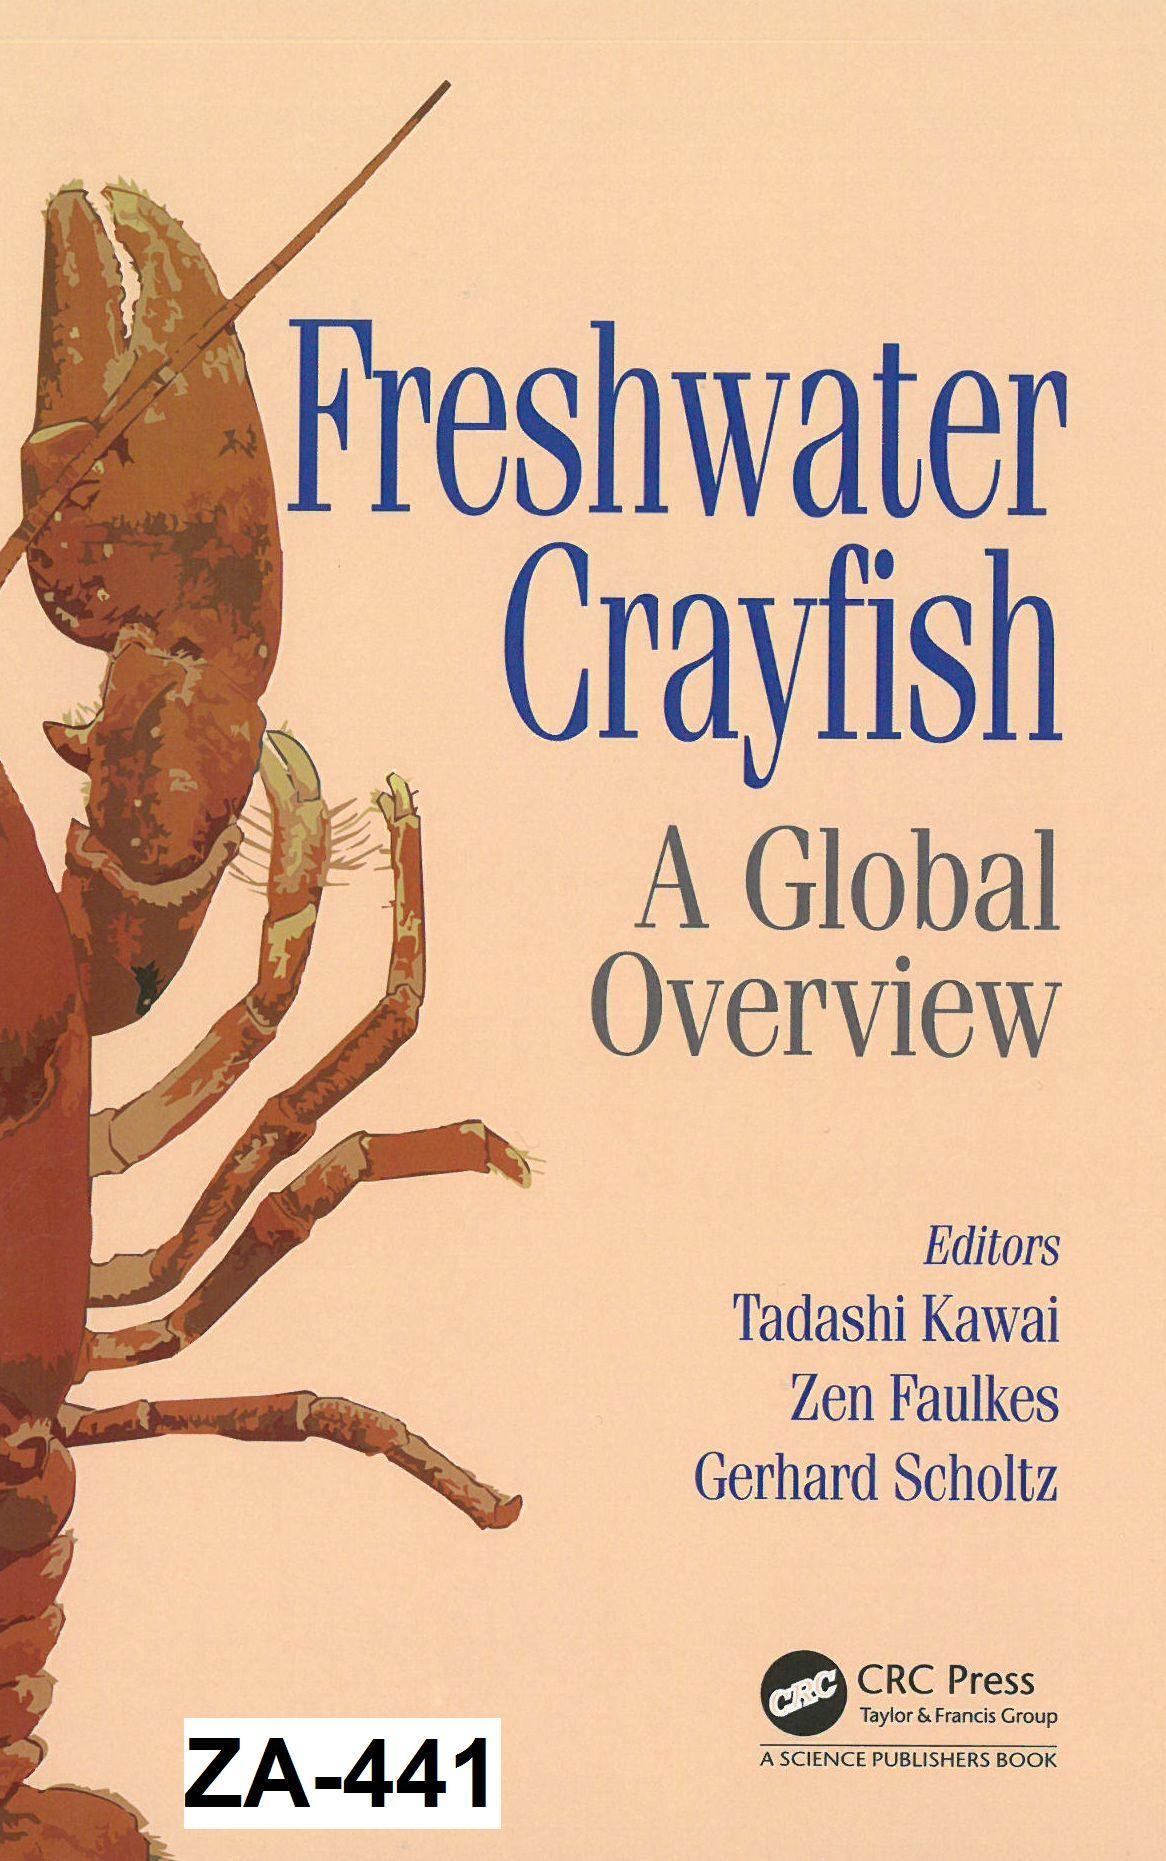 Freshwater Crayfish A Global Overview Editors Tadashi Kawai Zen Faulkes Gerhard Scholtz